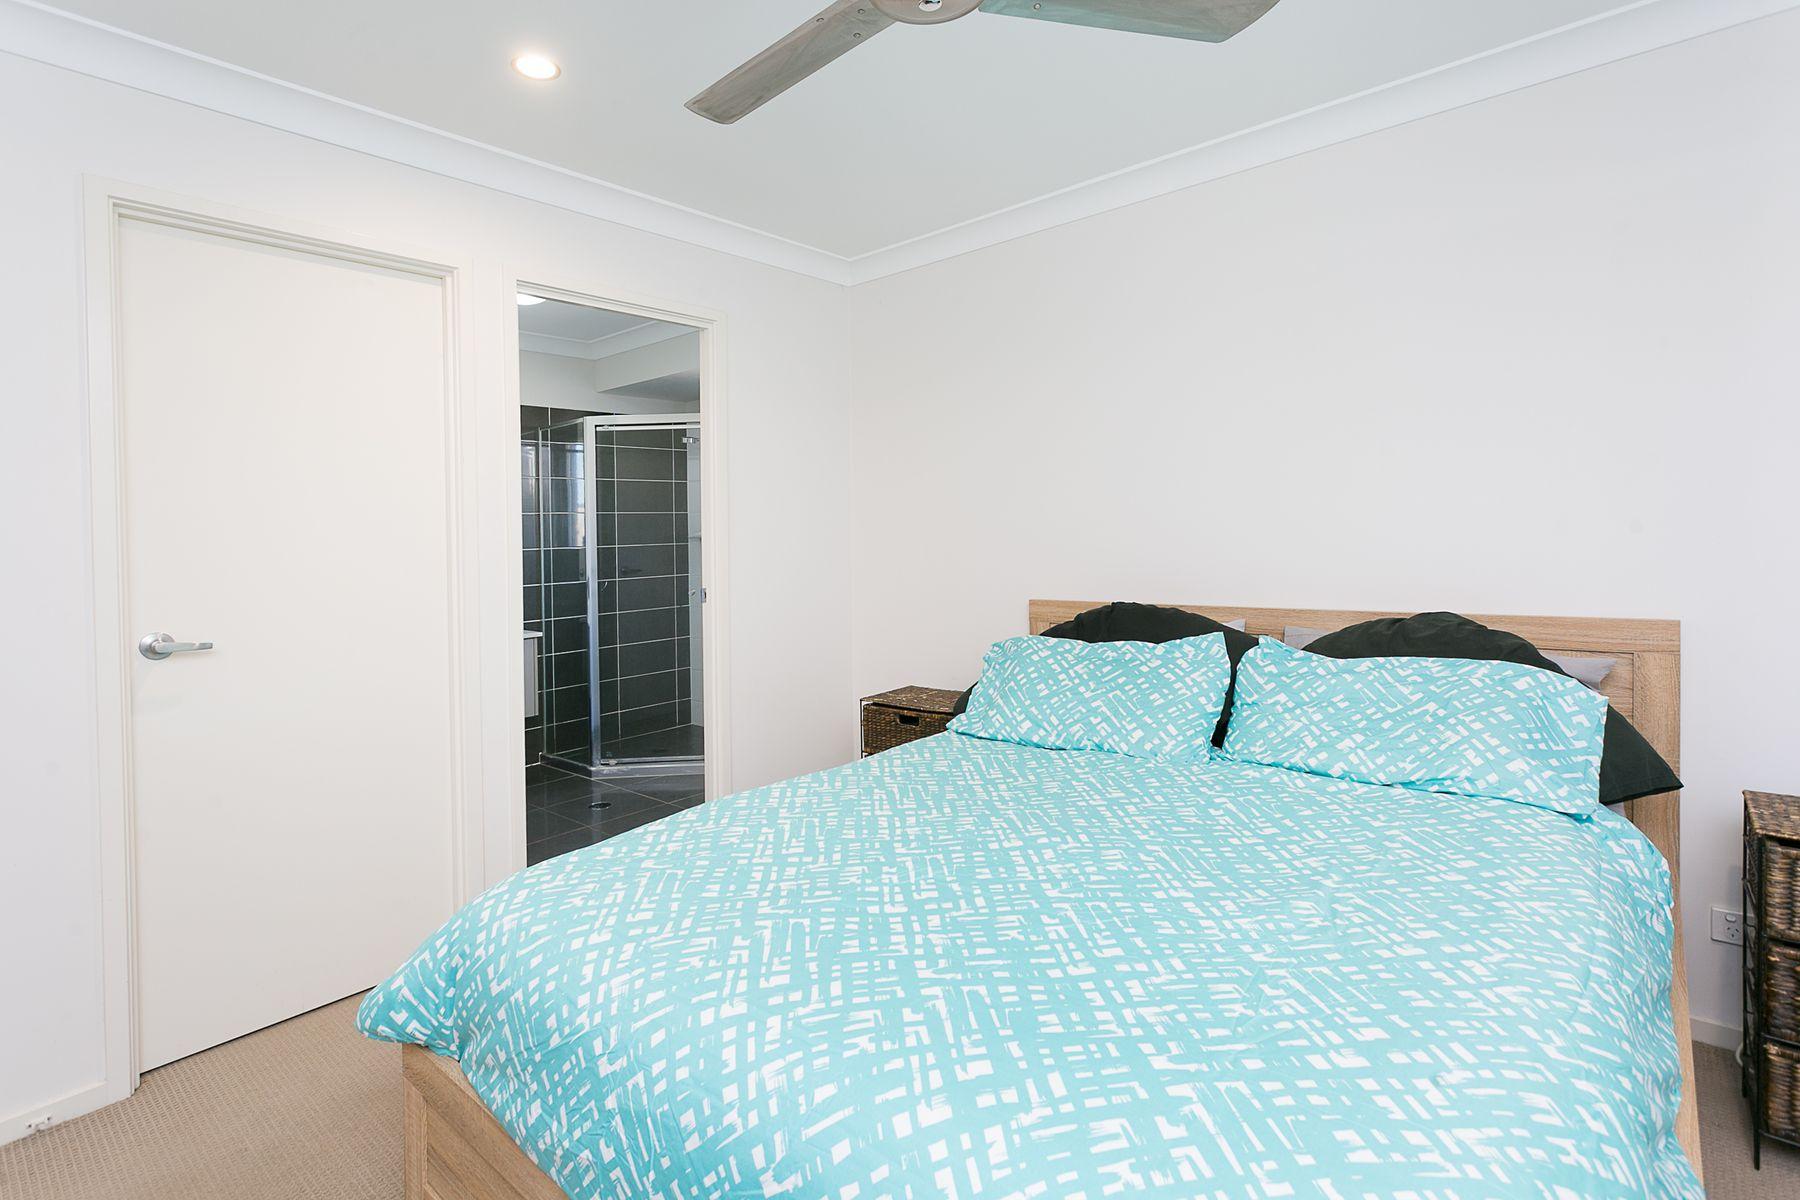 5 Carron Court, Brassall, QLD 4305